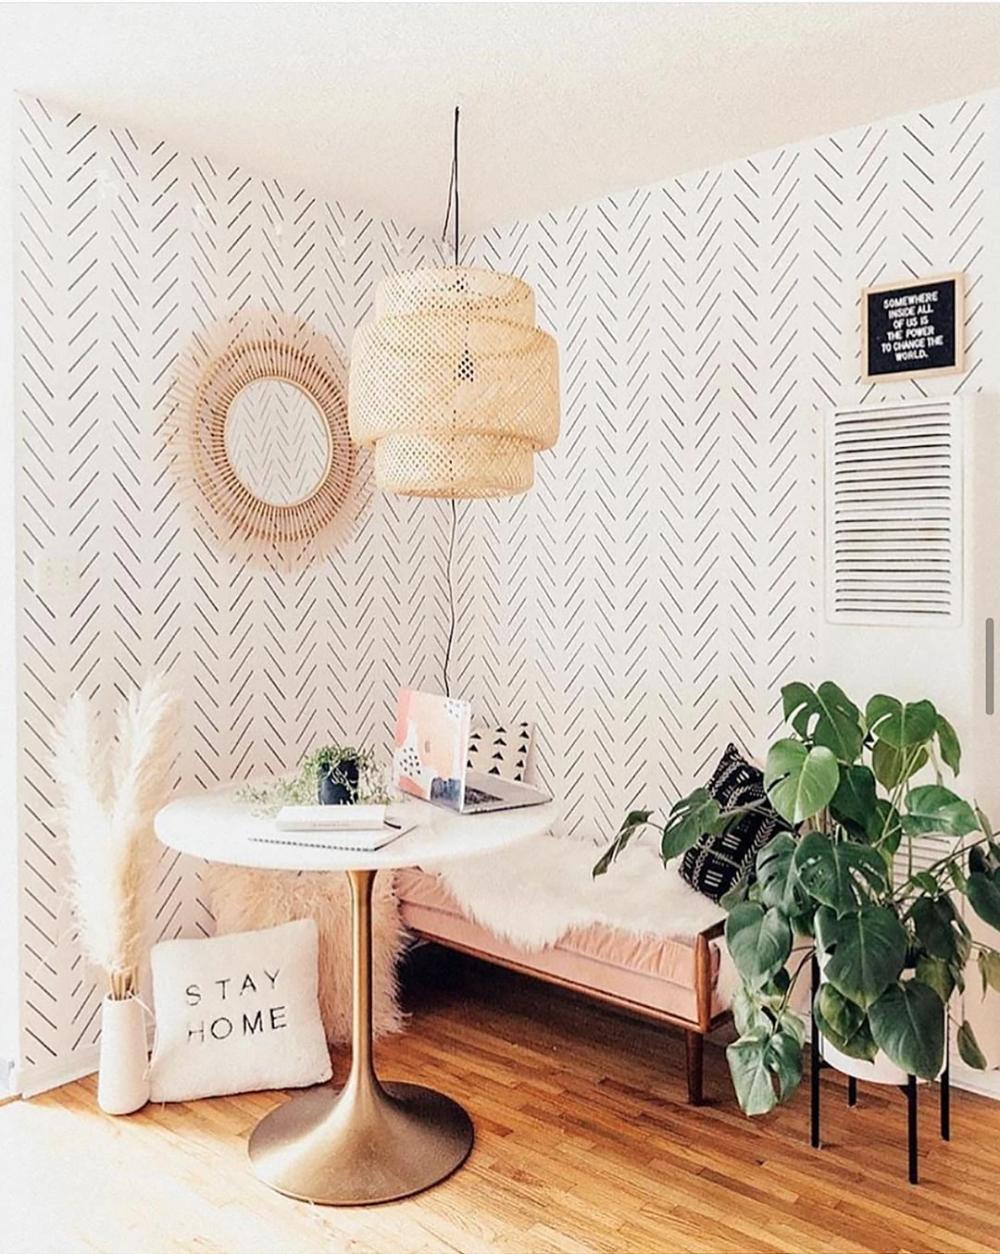 How To Decorate With Removable Wallpaper Modern Delicate Herringbone Design In 2021 Herringbone Wallpaper Interior Design Inspiration Decor